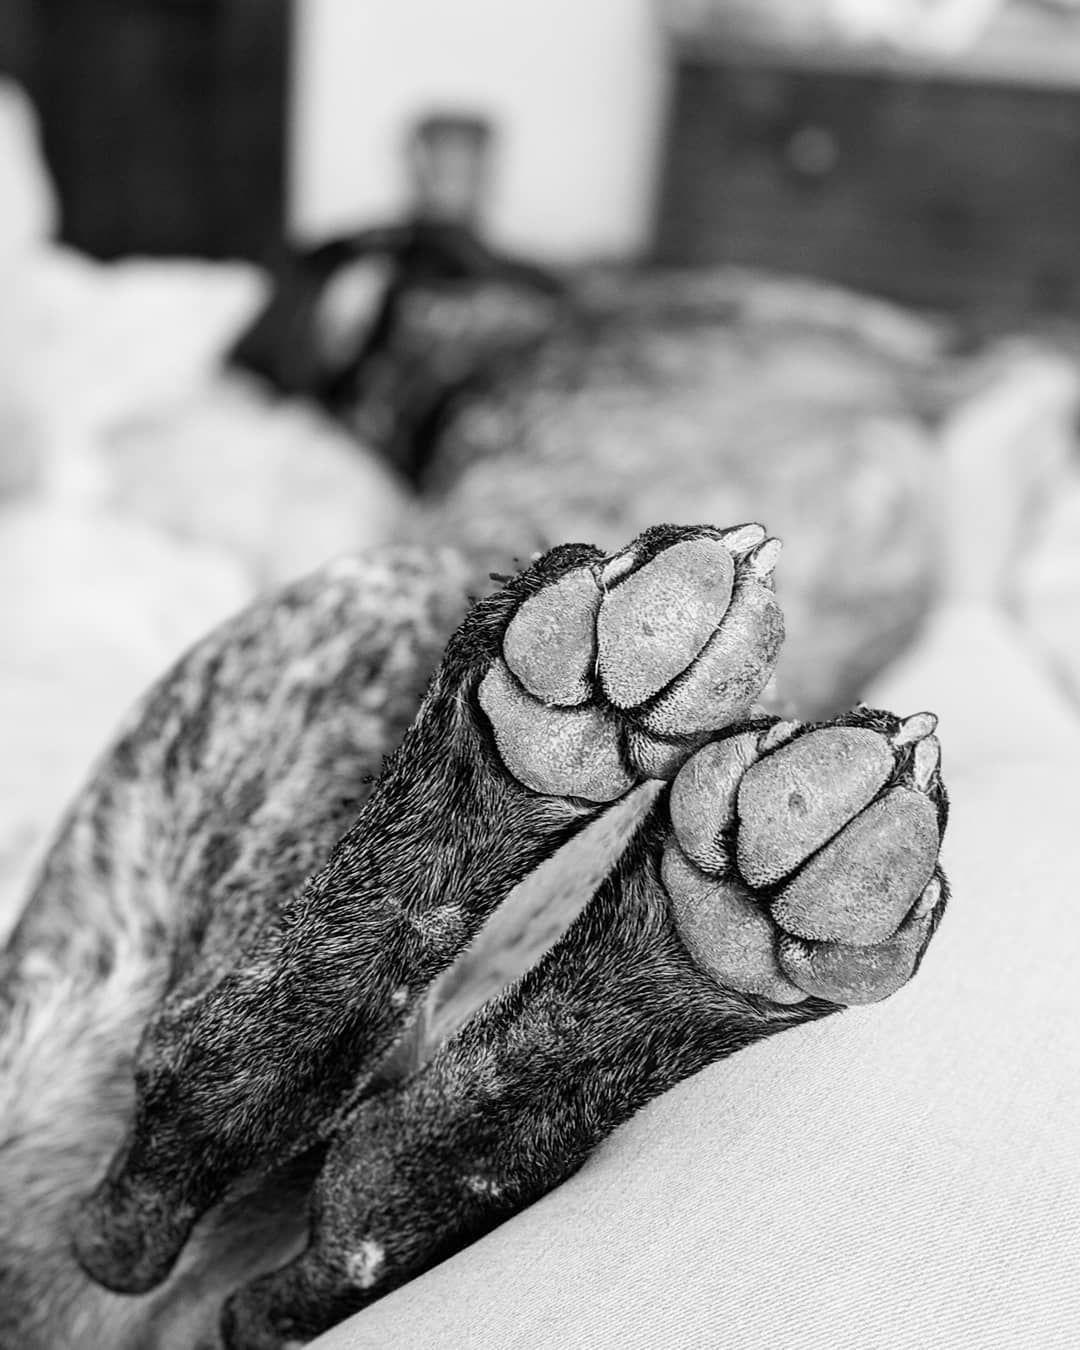 #Ella#staffordshirebullterrier#puppy#illustration#ipadproartist#adobefresco#adobe #mehacesundibujito